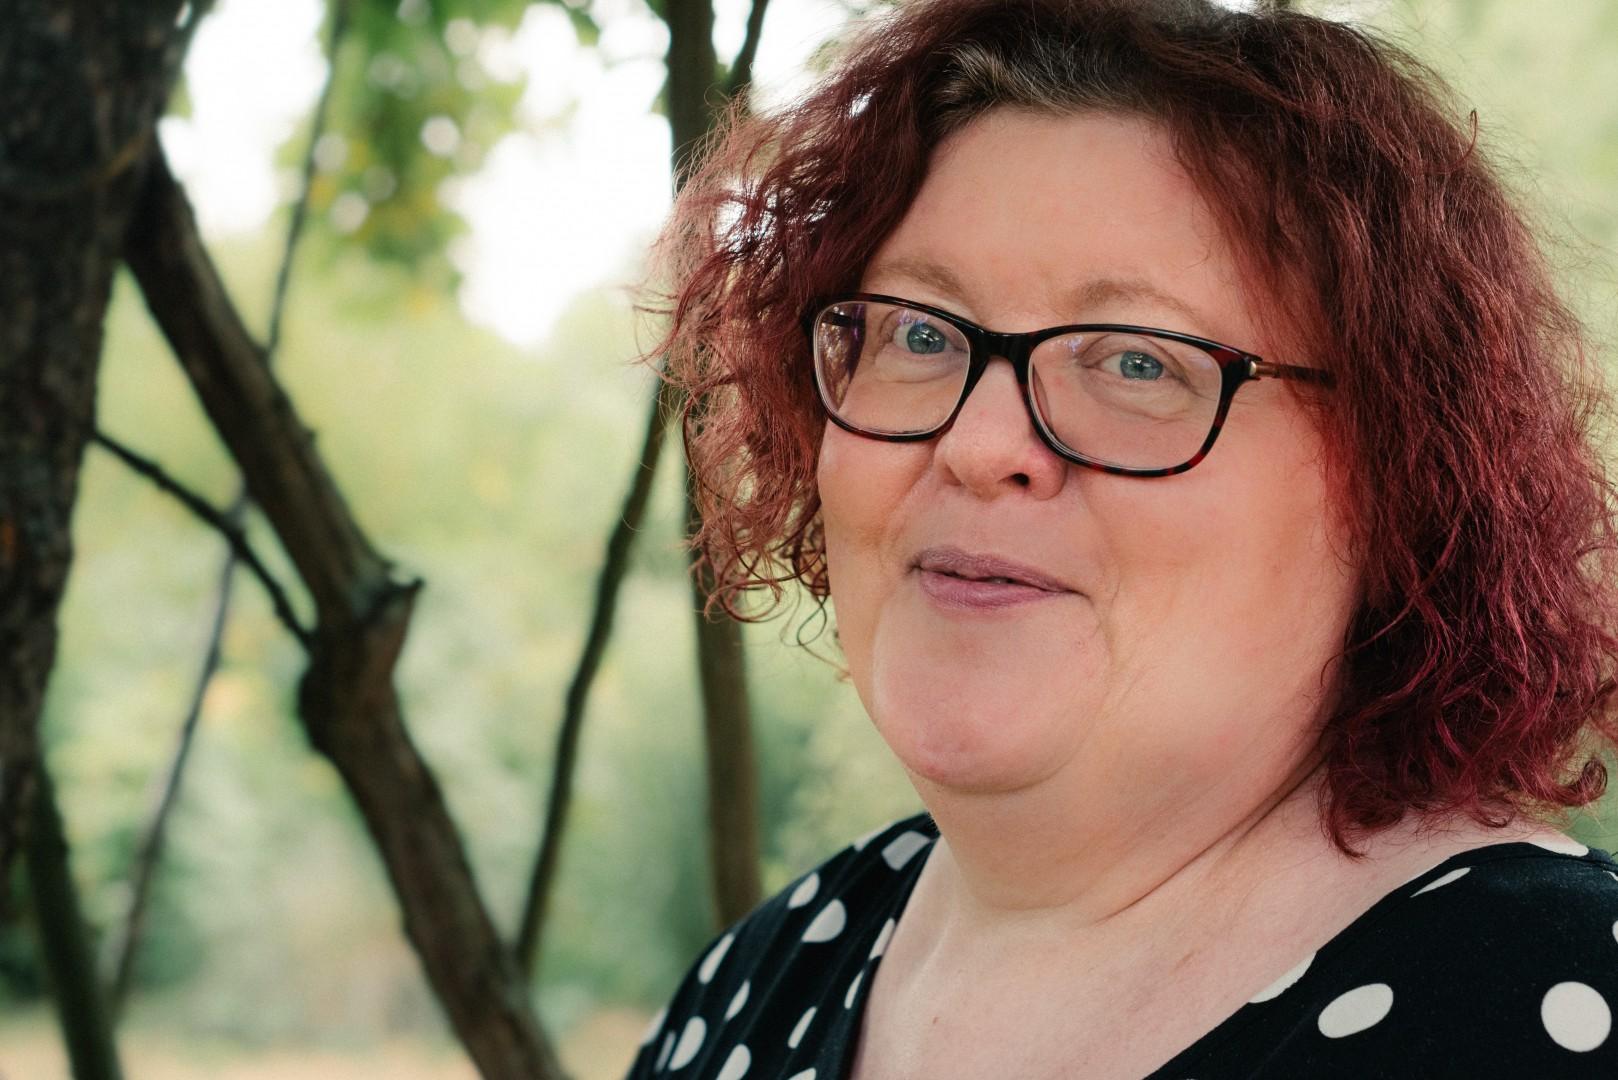 Susanne Strefel